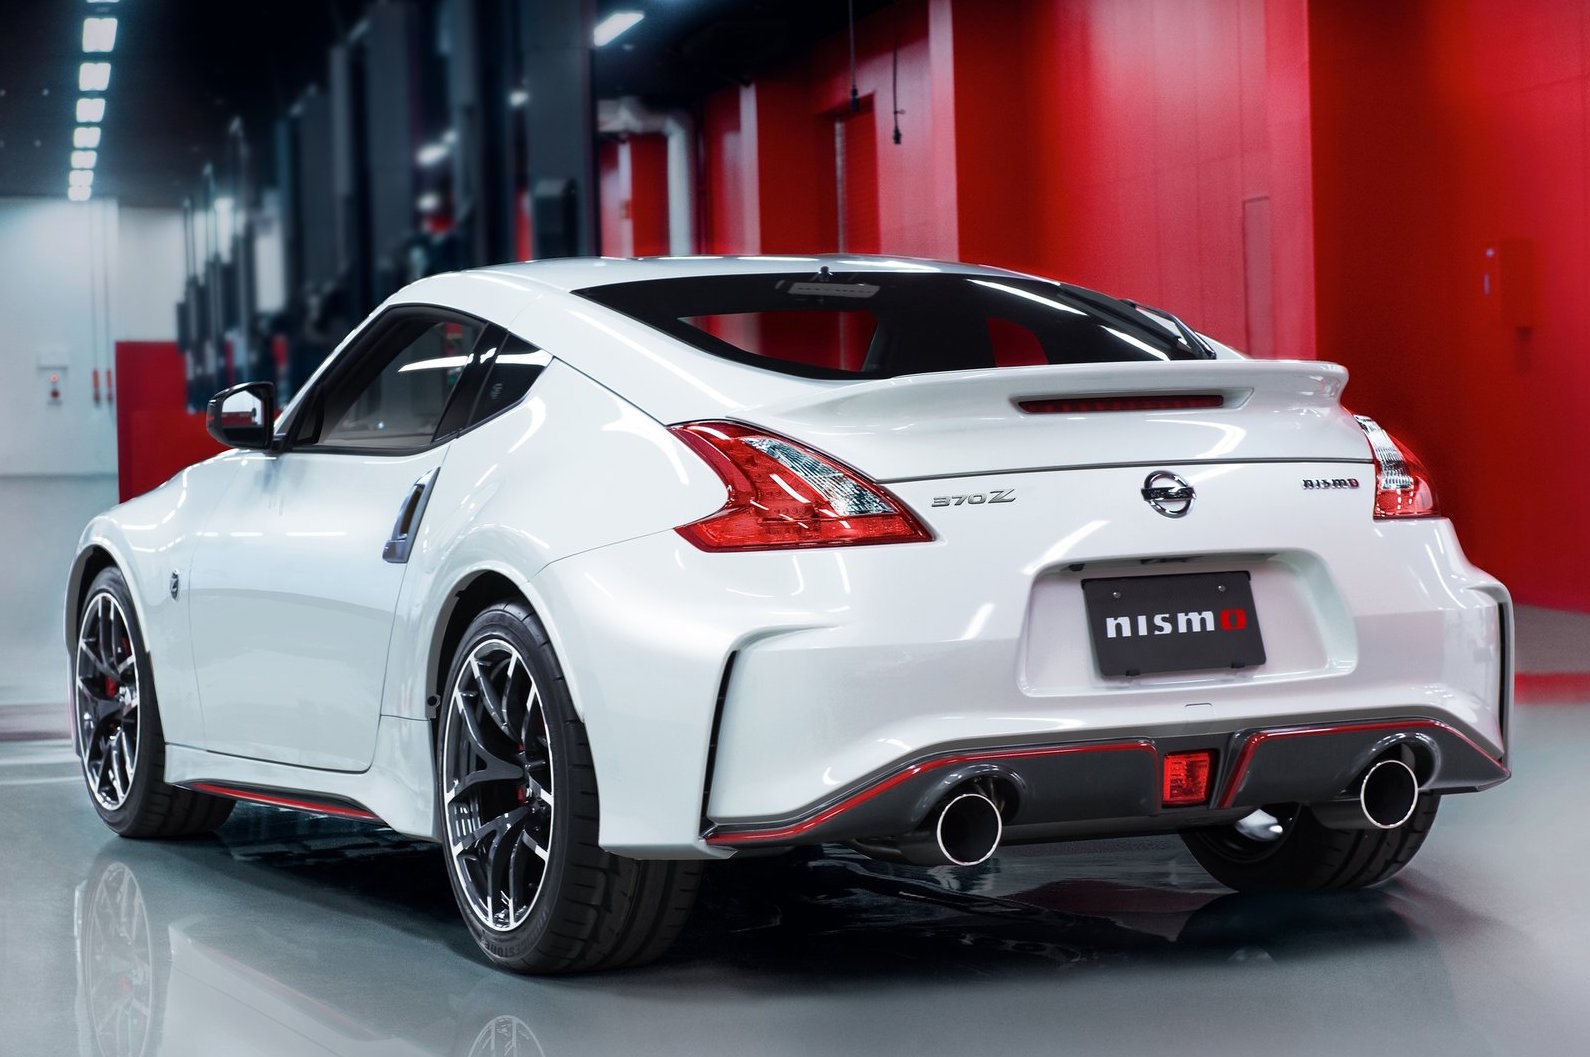 Nissan 370z Nismo On Sale In Australia From 61 490 Performancedrive